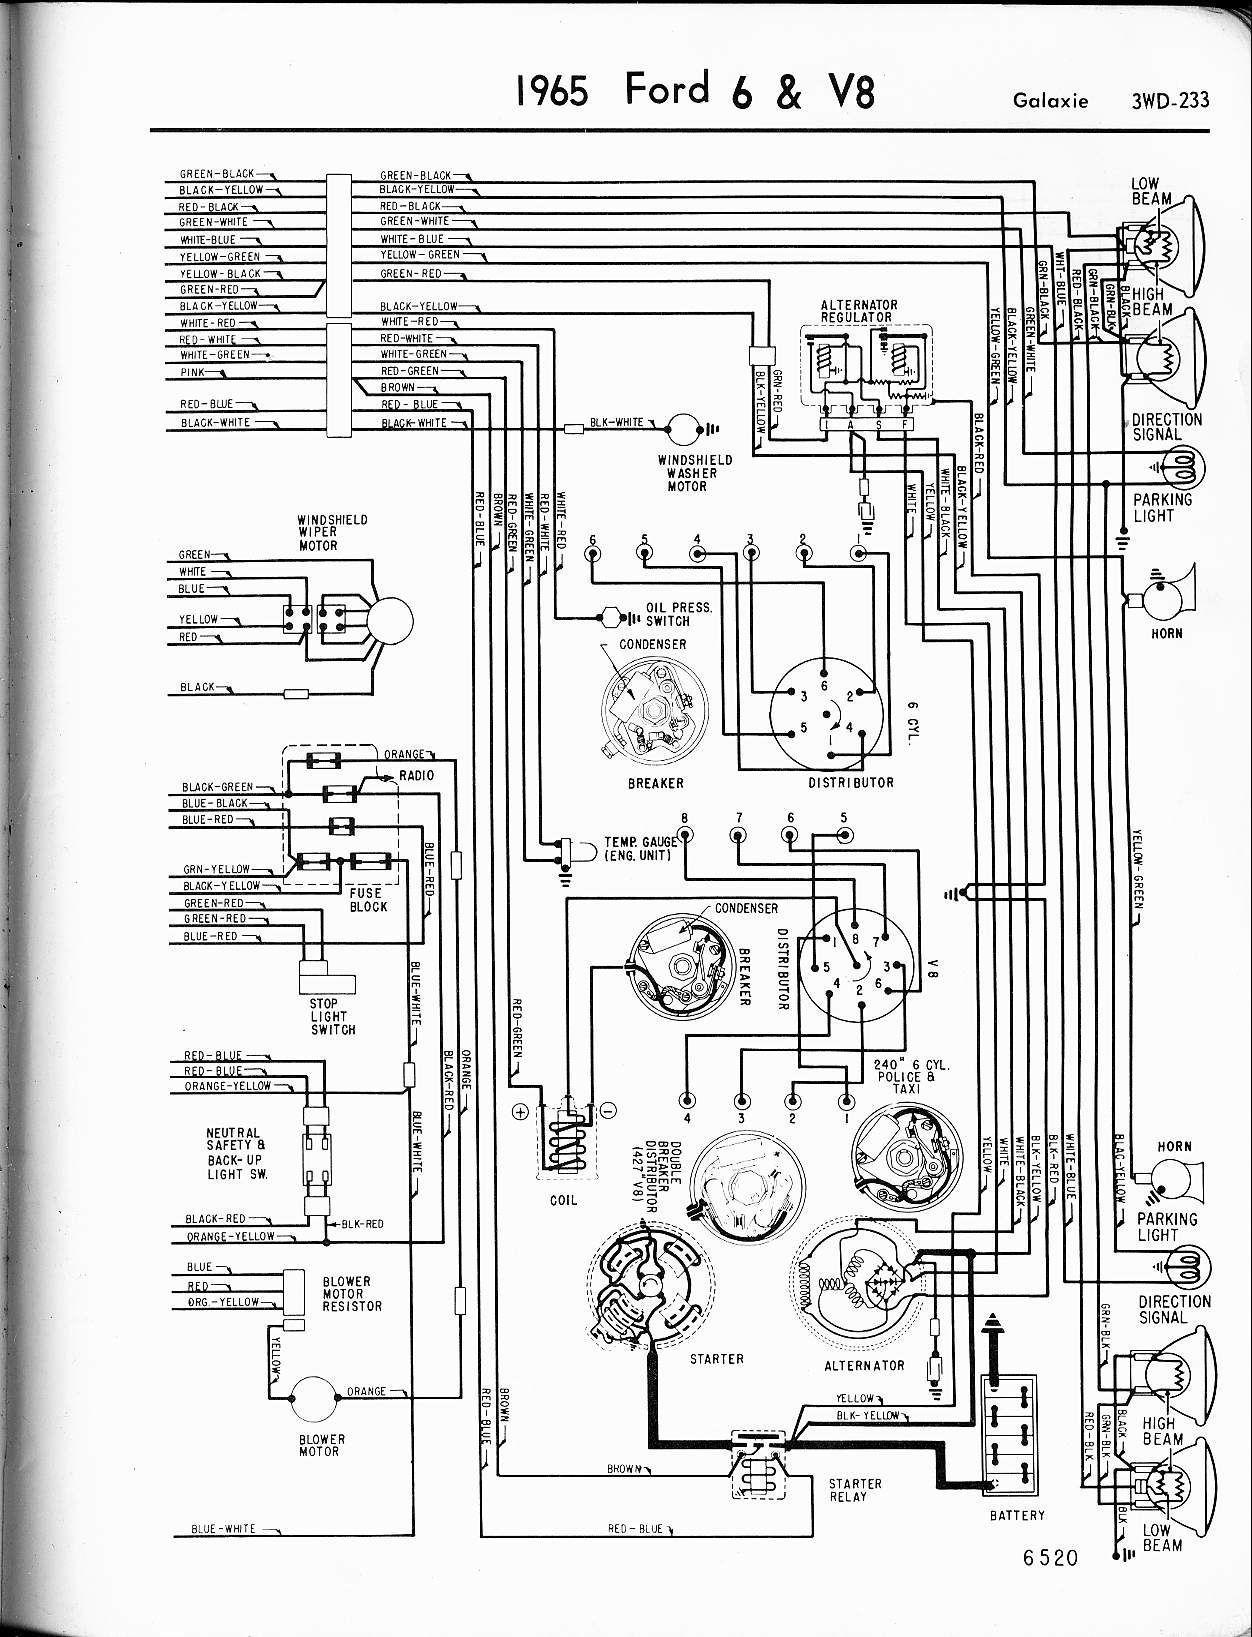 Pin on Schematic Wiring Diagram